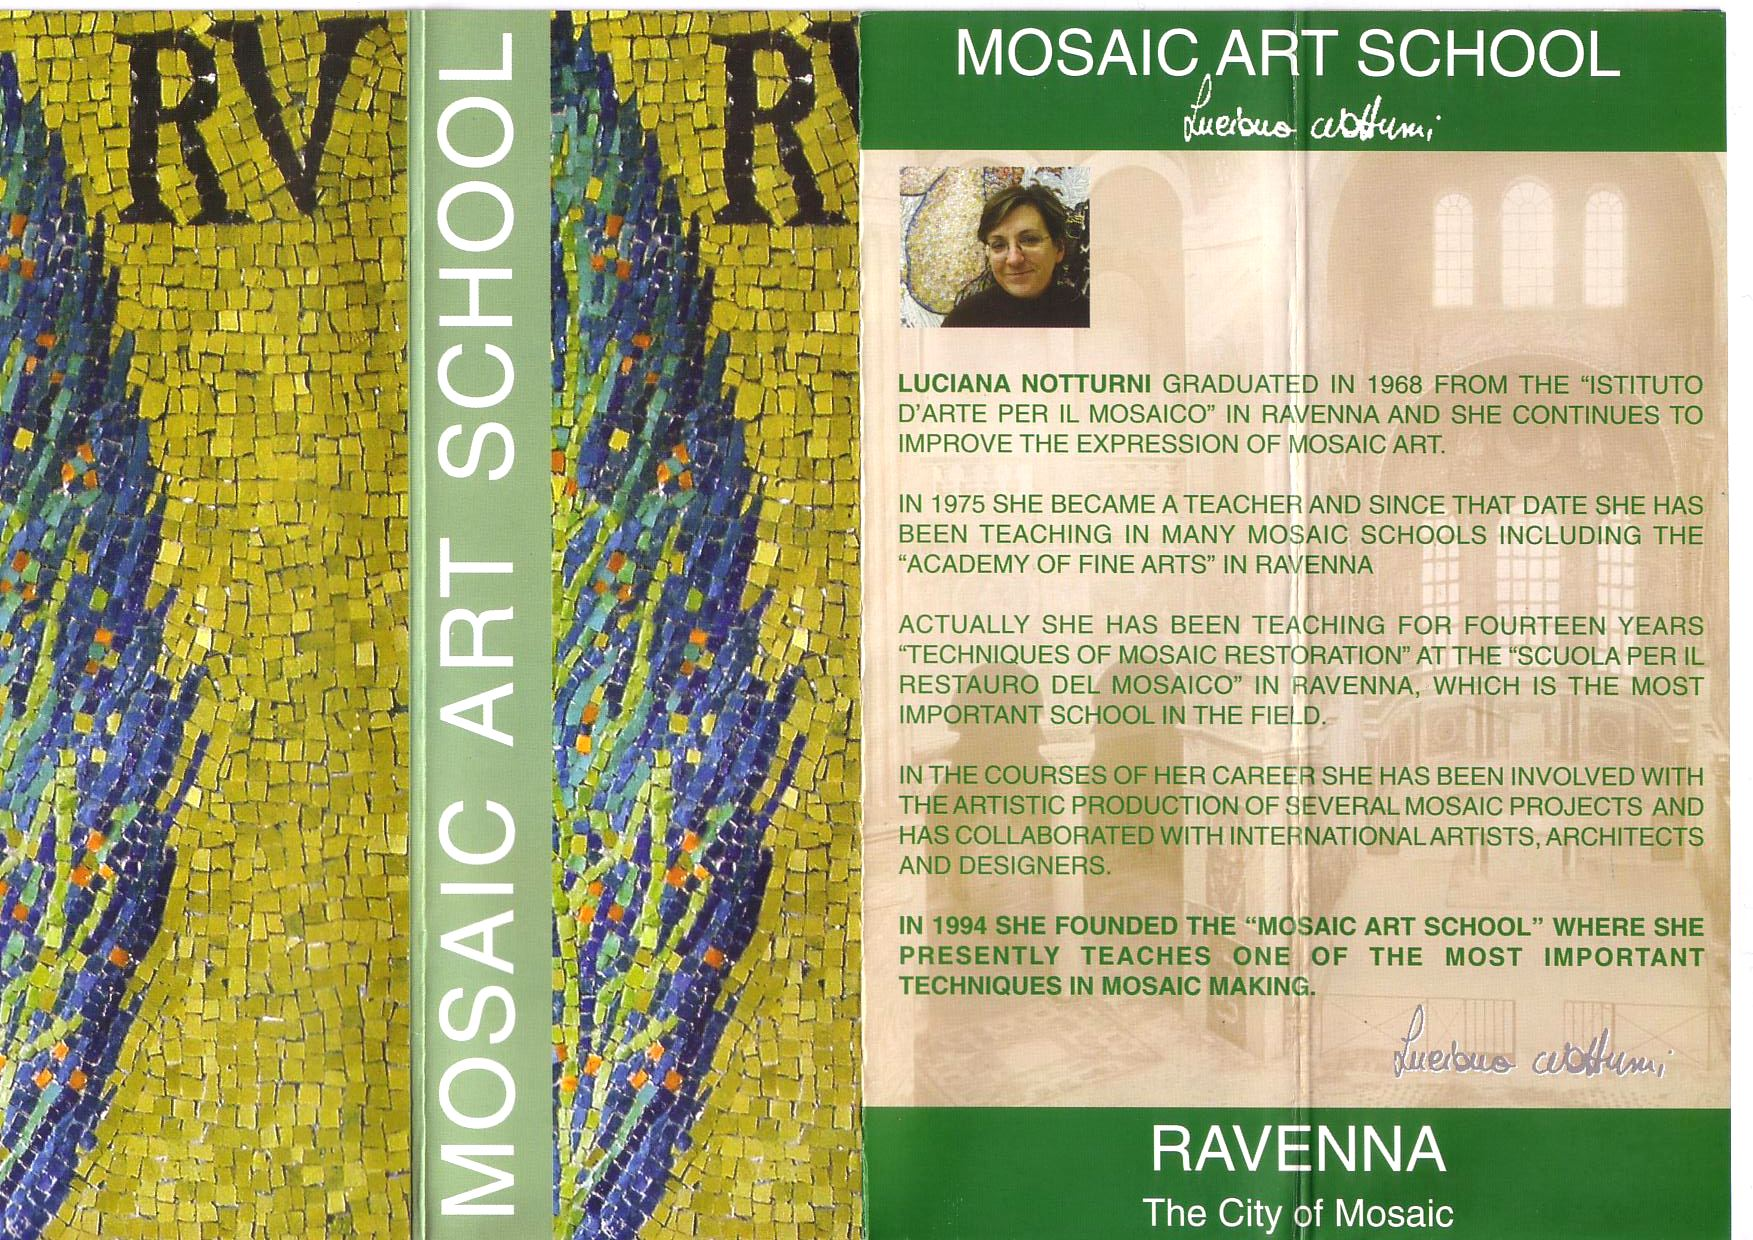 Save0012 - Mosaic Art School